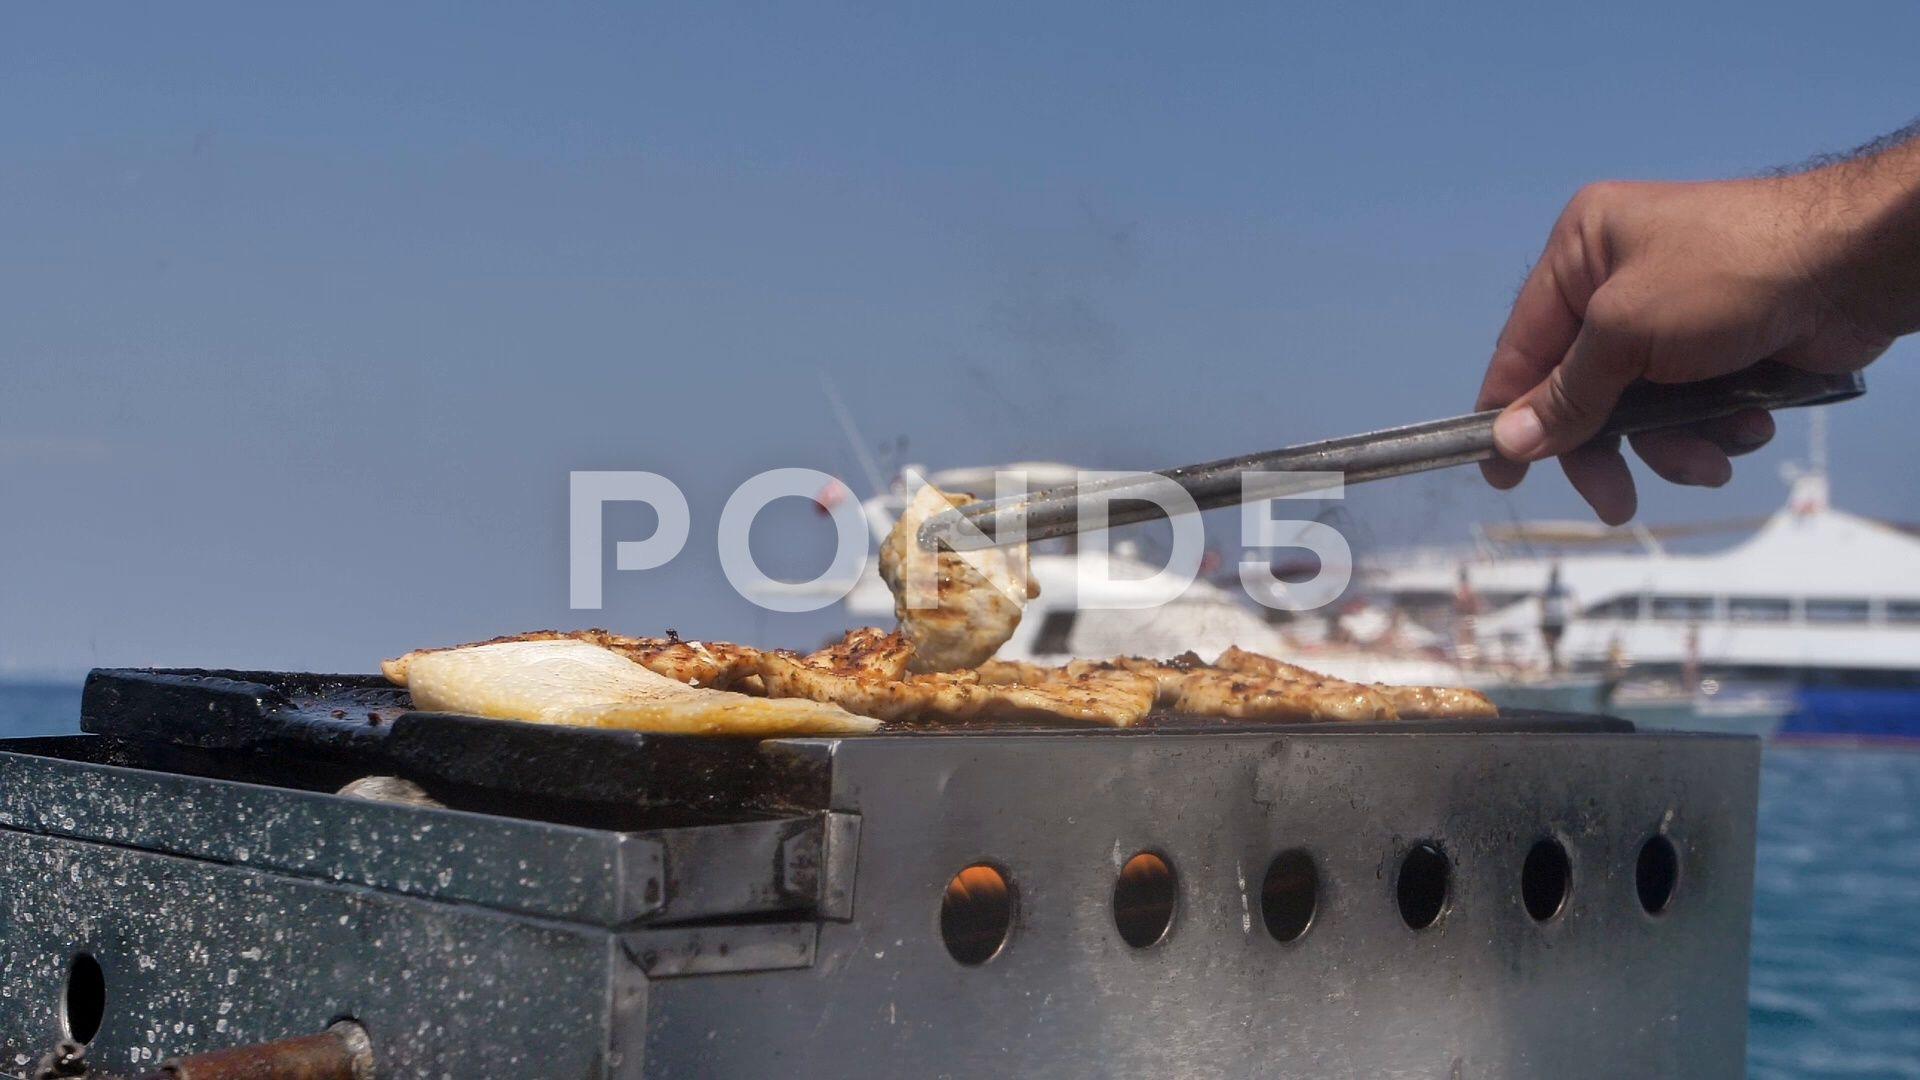 A man fries meat near the ocean twists it on the grill Fire burns in the iron Stock Footage oceantwistsmeatman